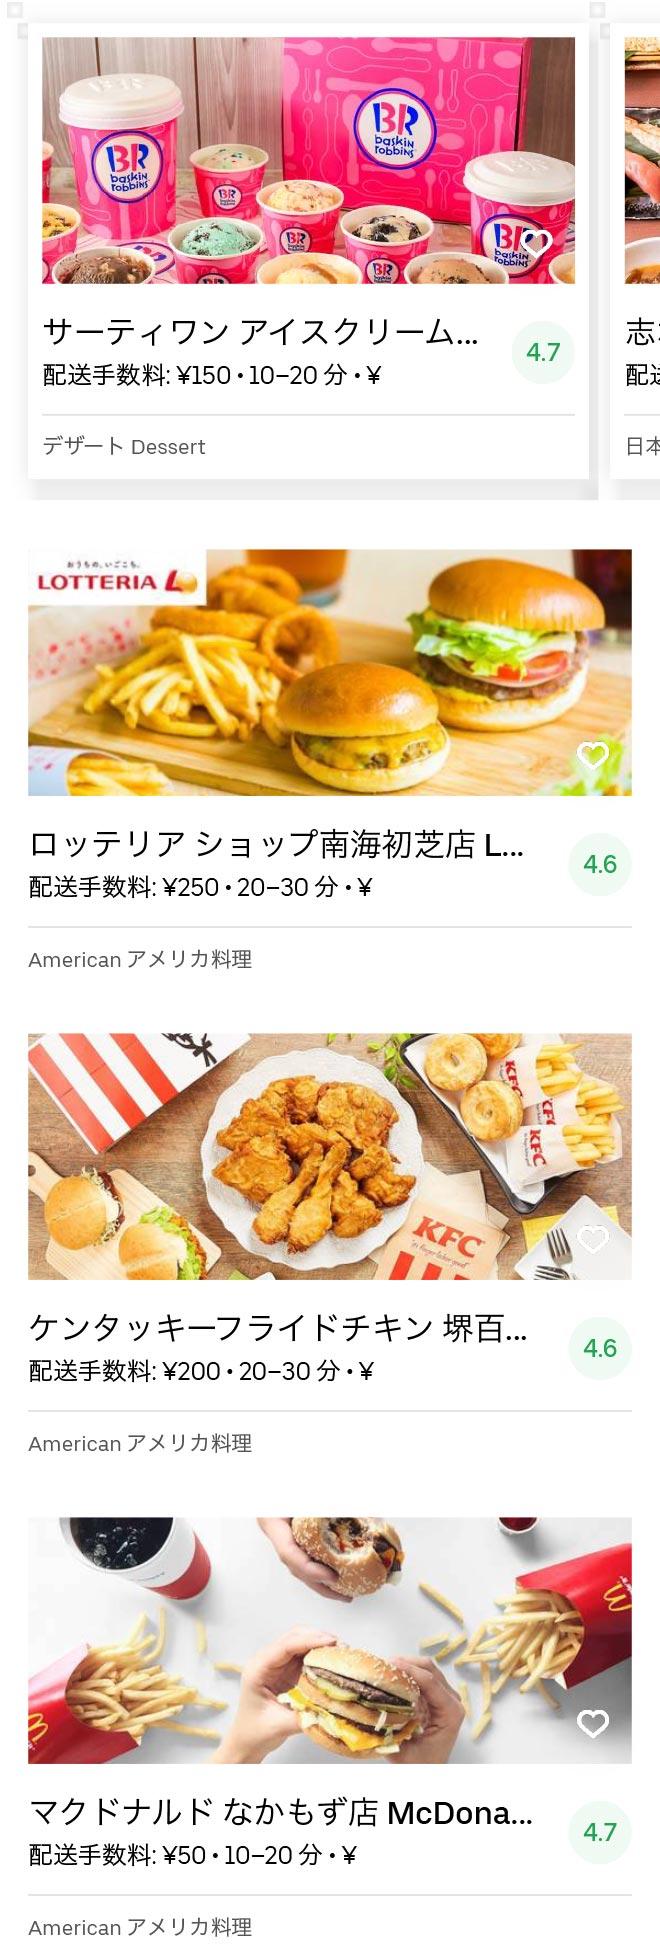 Sakai nakamozu menu 2005 02